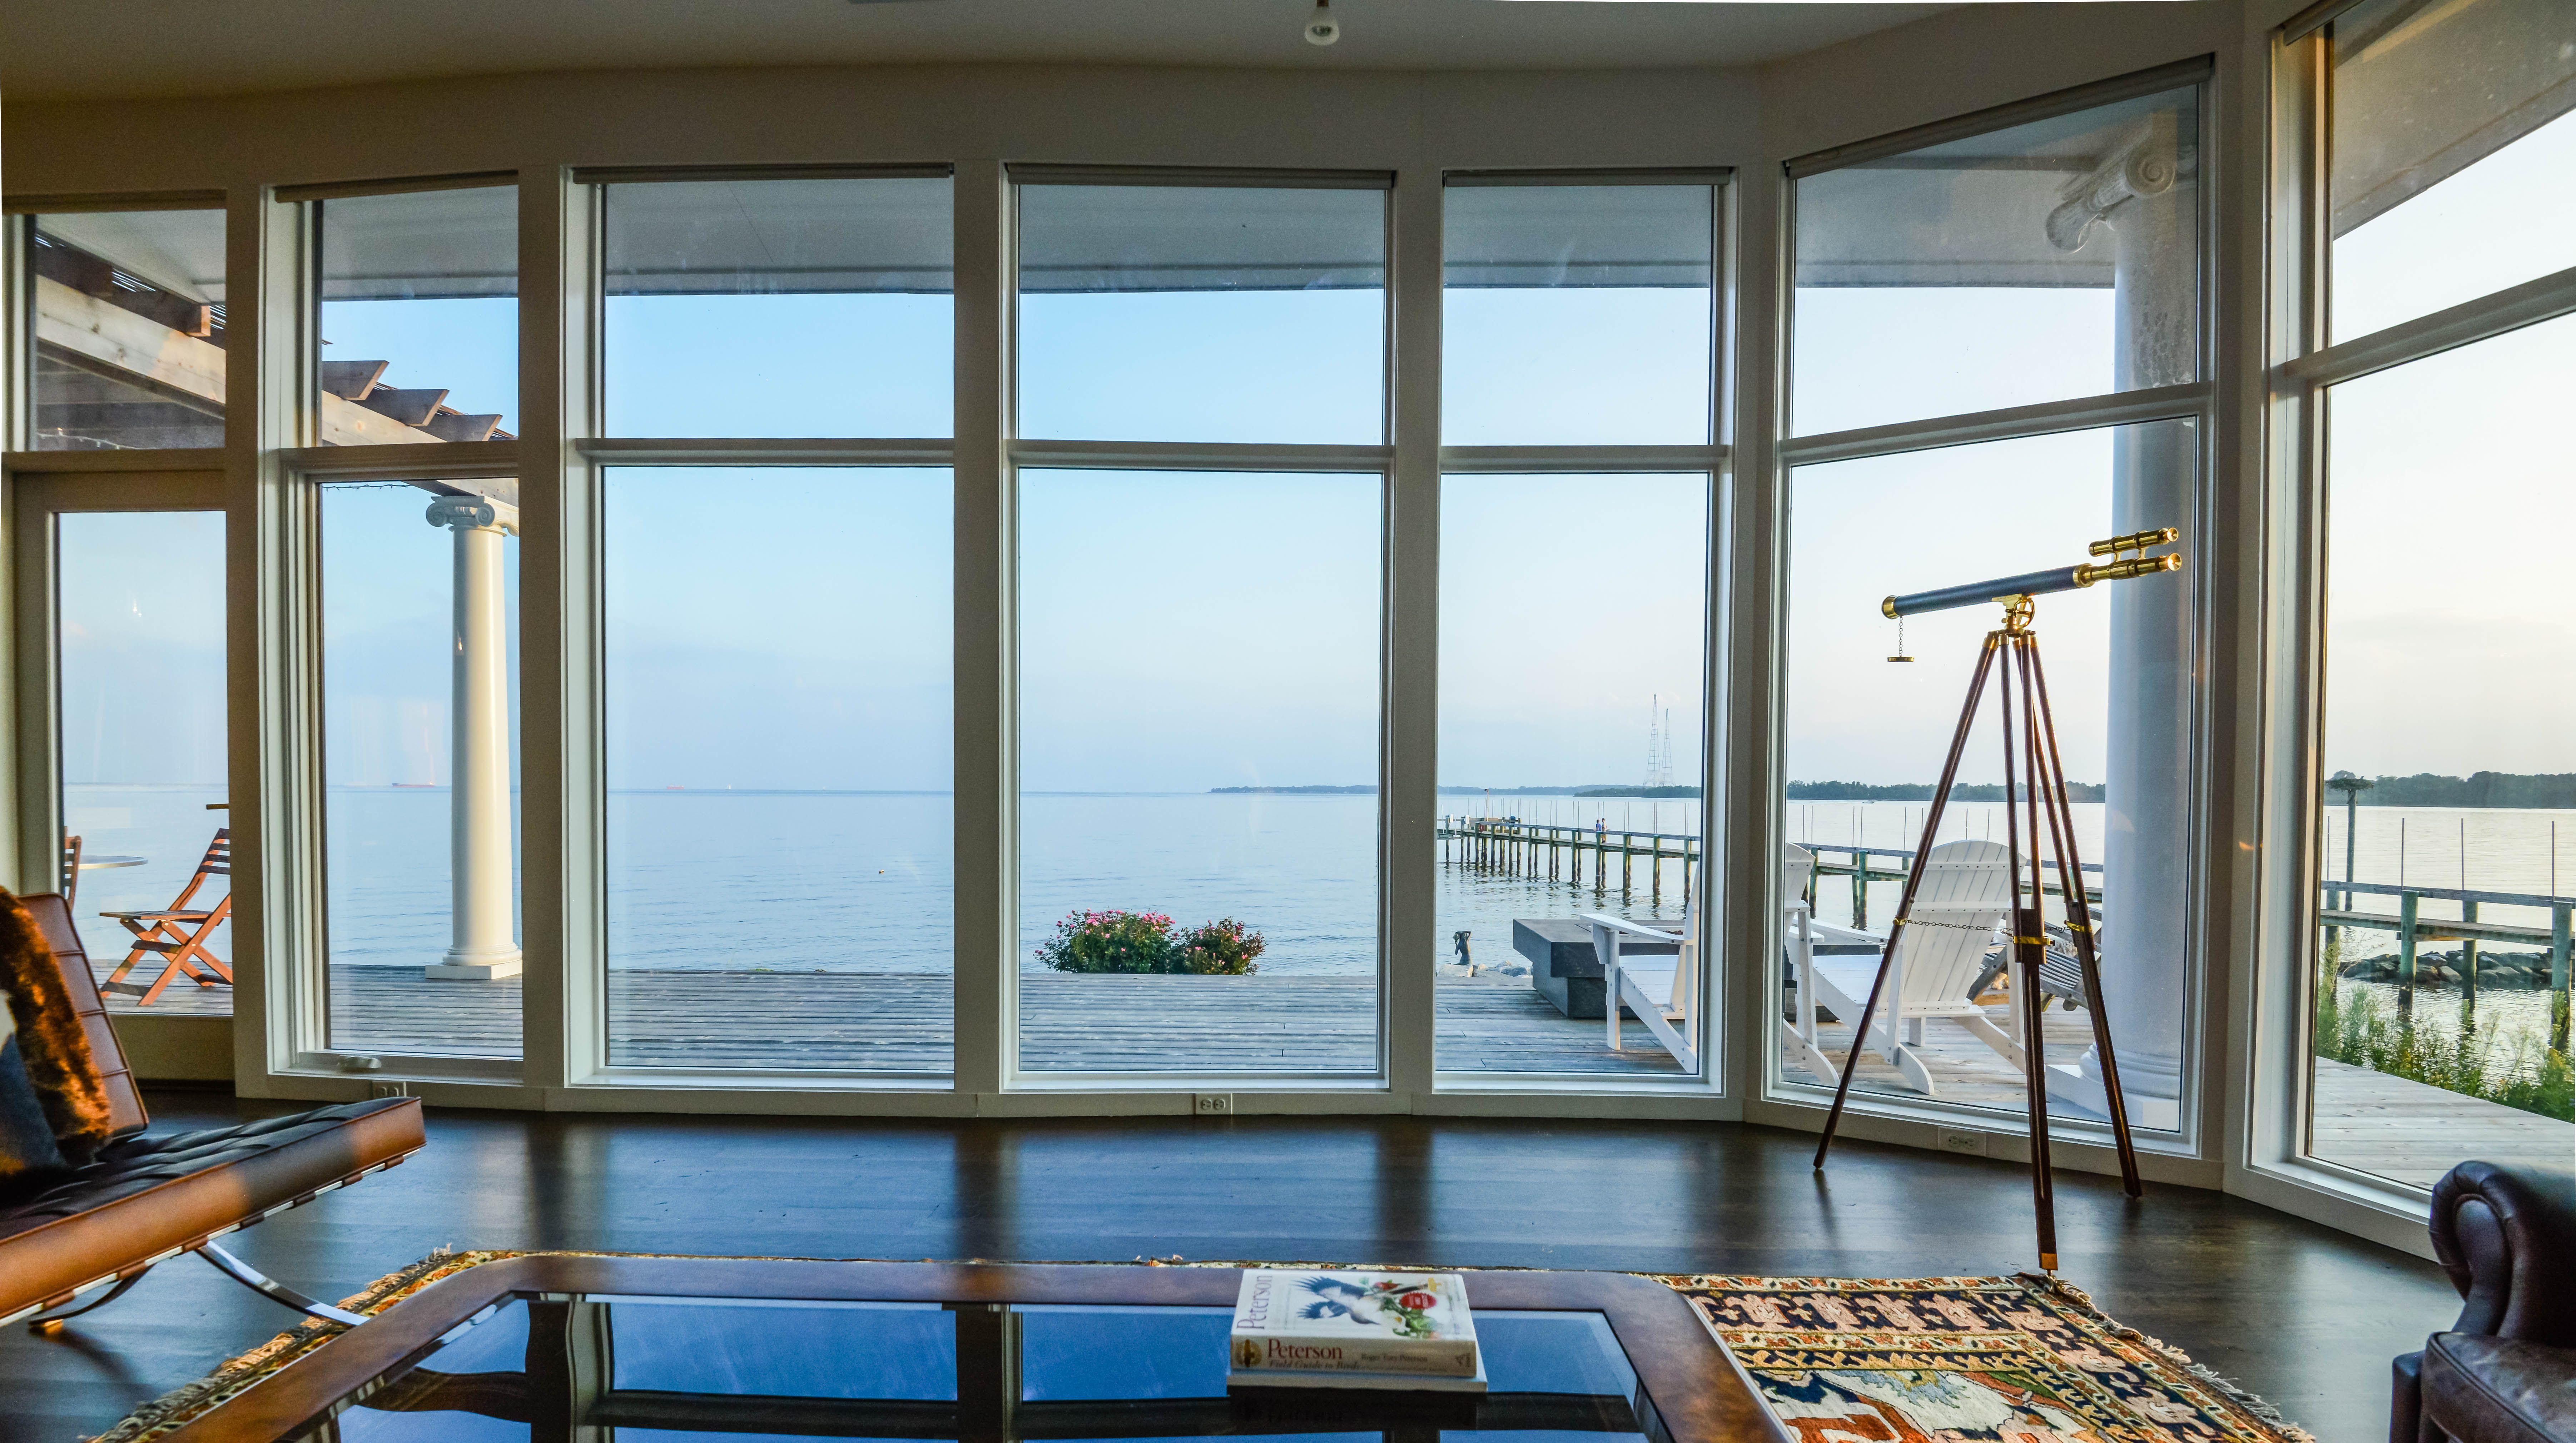 Pin by Windsor Windows & Doors on Modern Style Homes | Pinterest